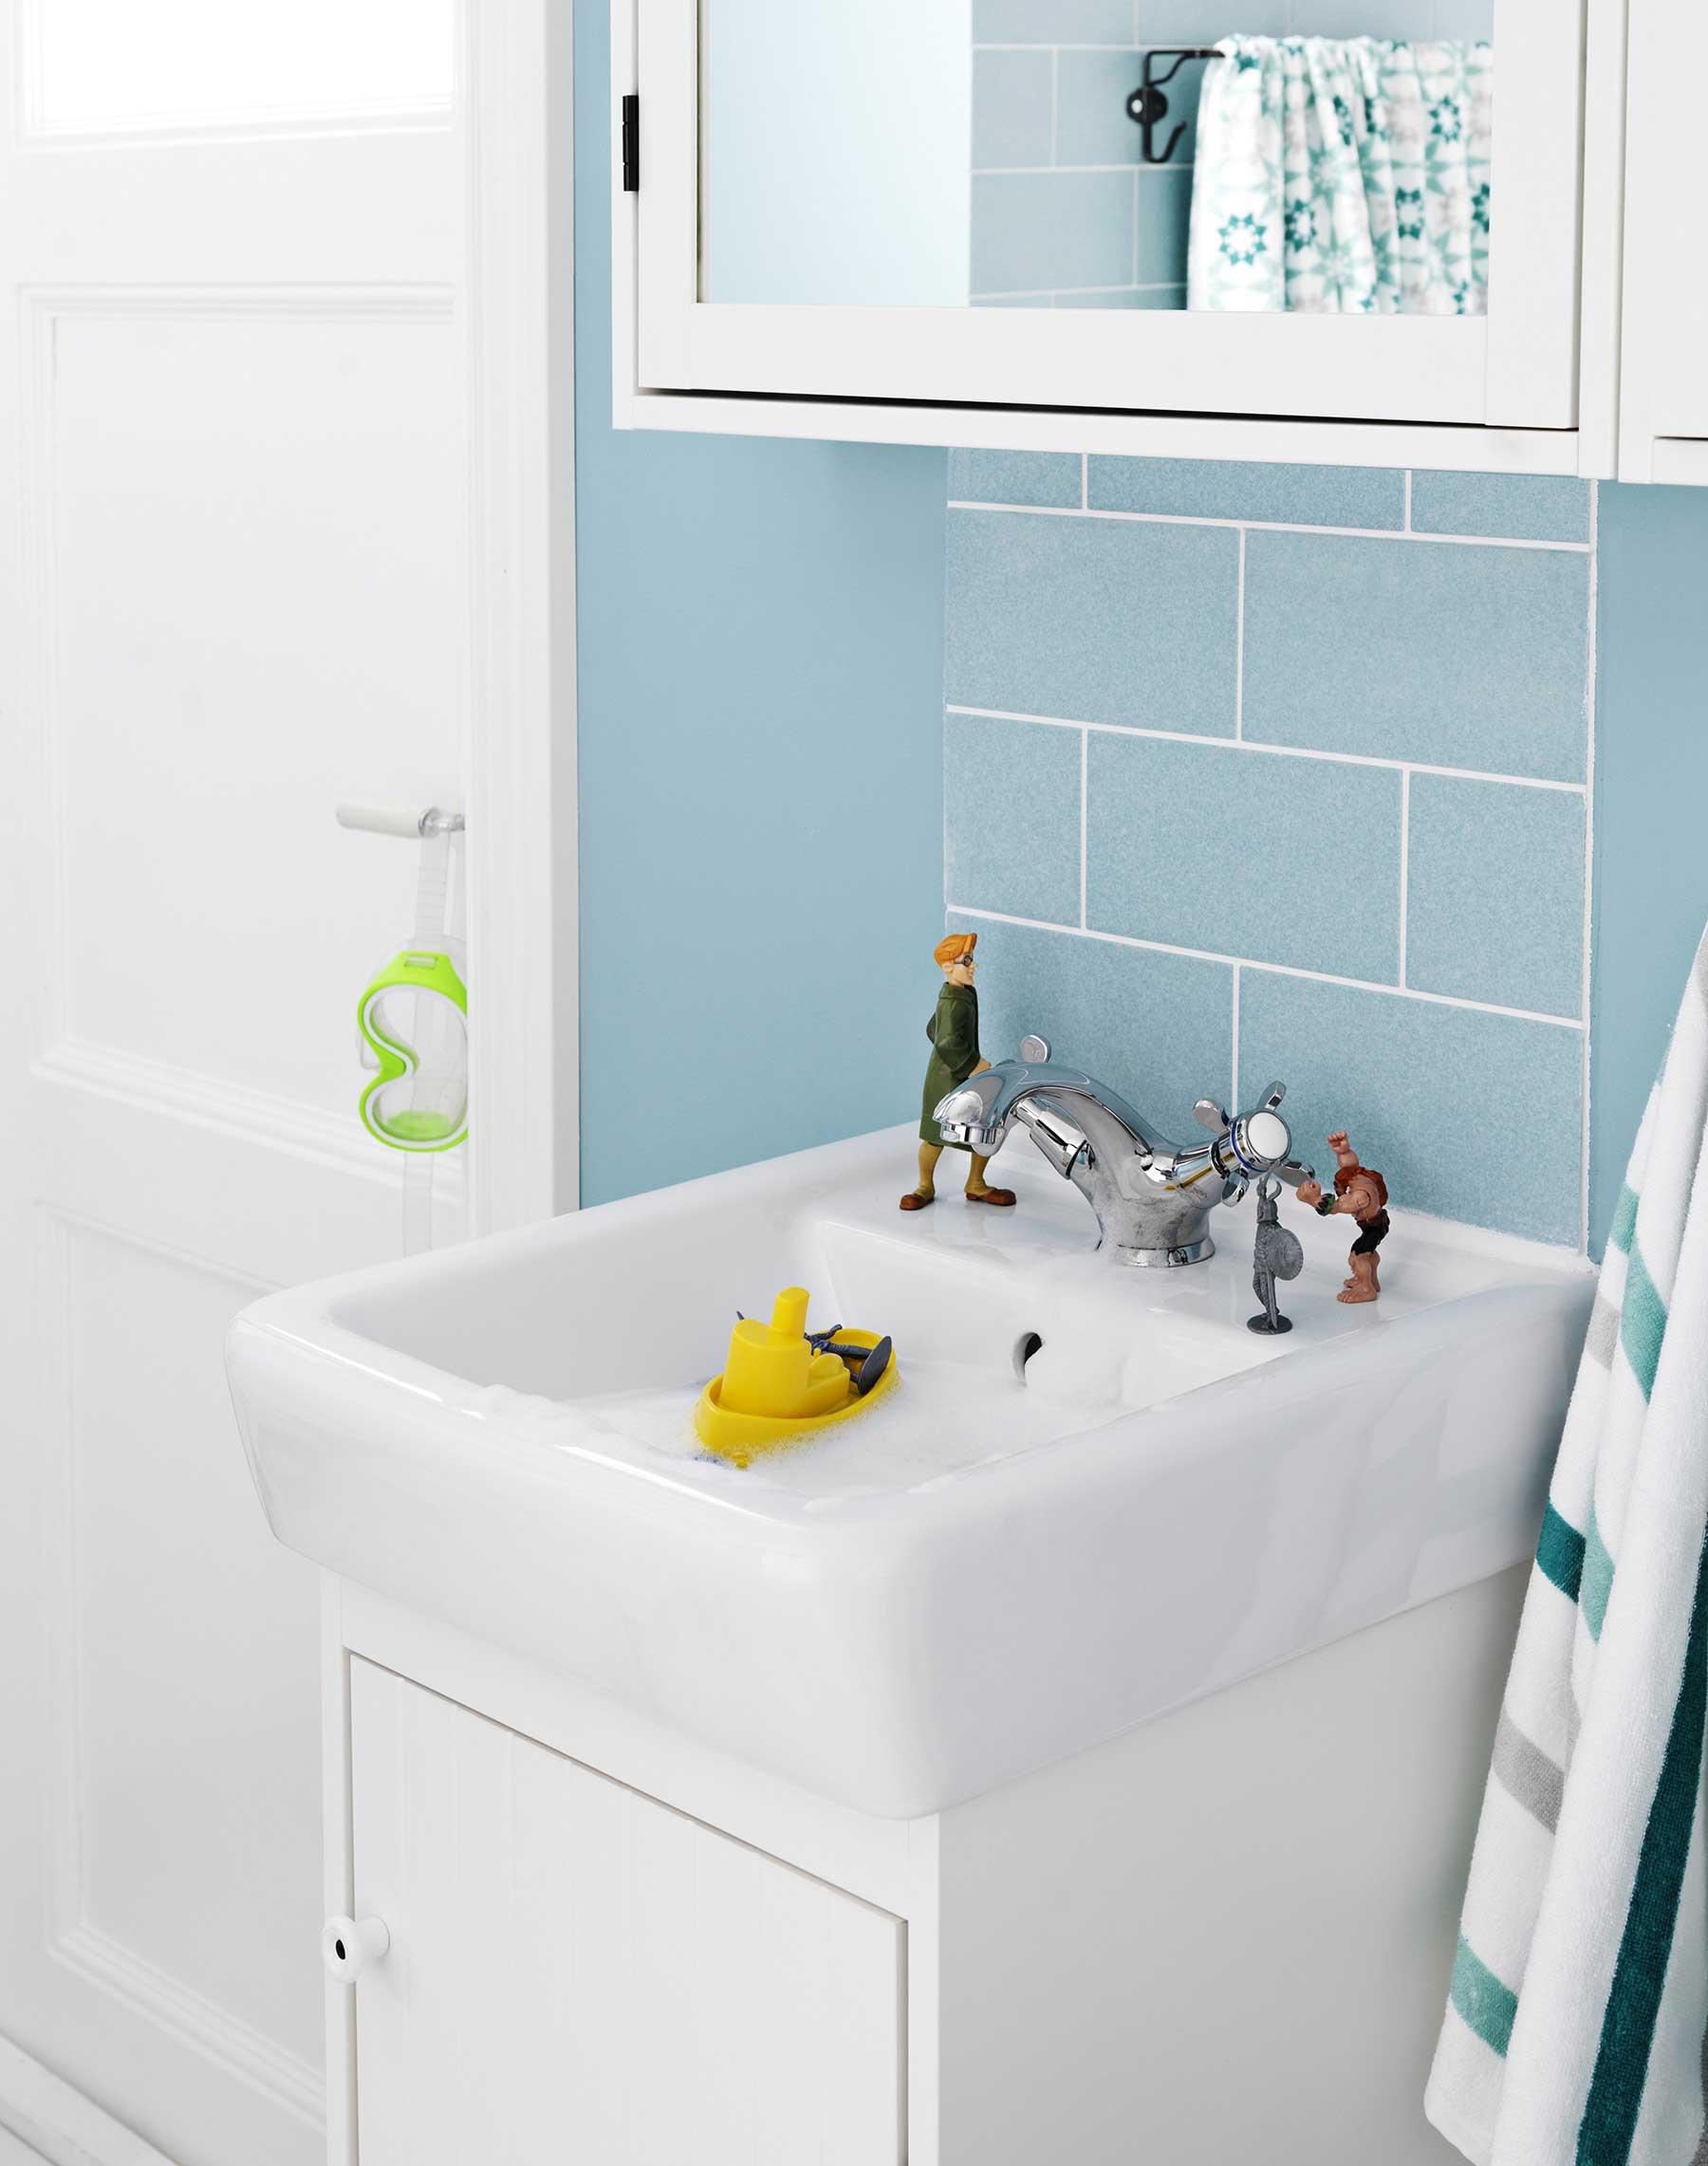 Salle de bains ikea for Meuble de rangement salle de bain ikea